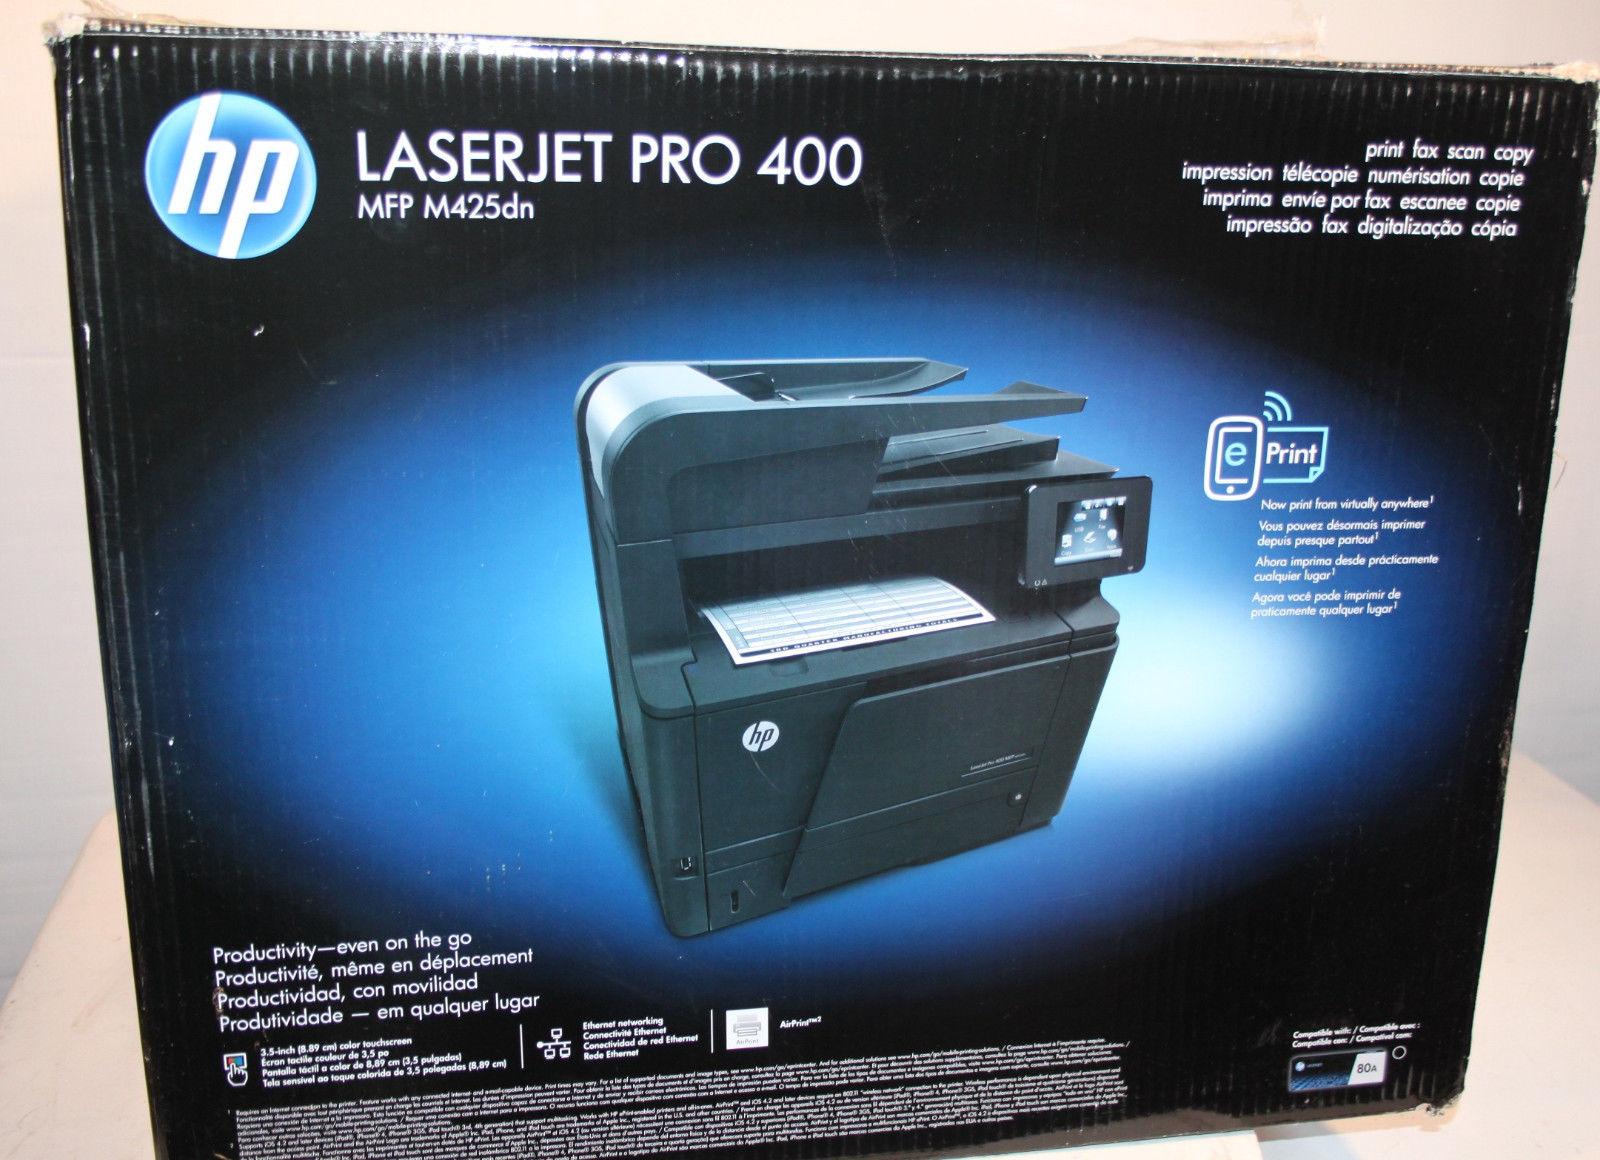 hp laserjet pro 400 mfp m425dn driver